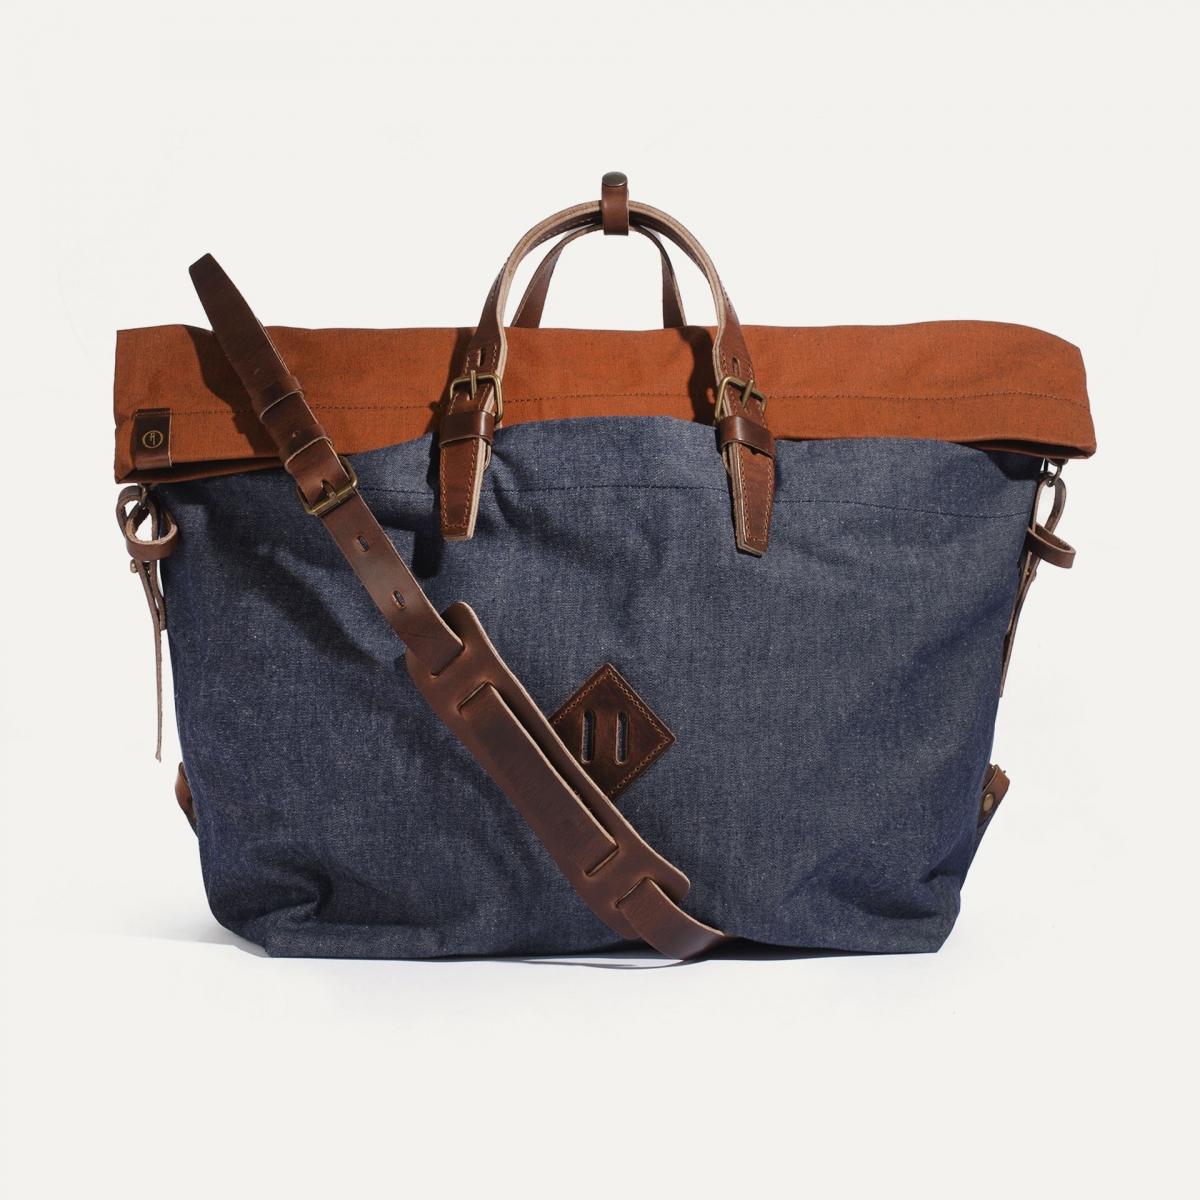 Woody L Backpack - Denim/Terra cotta (image n°1)